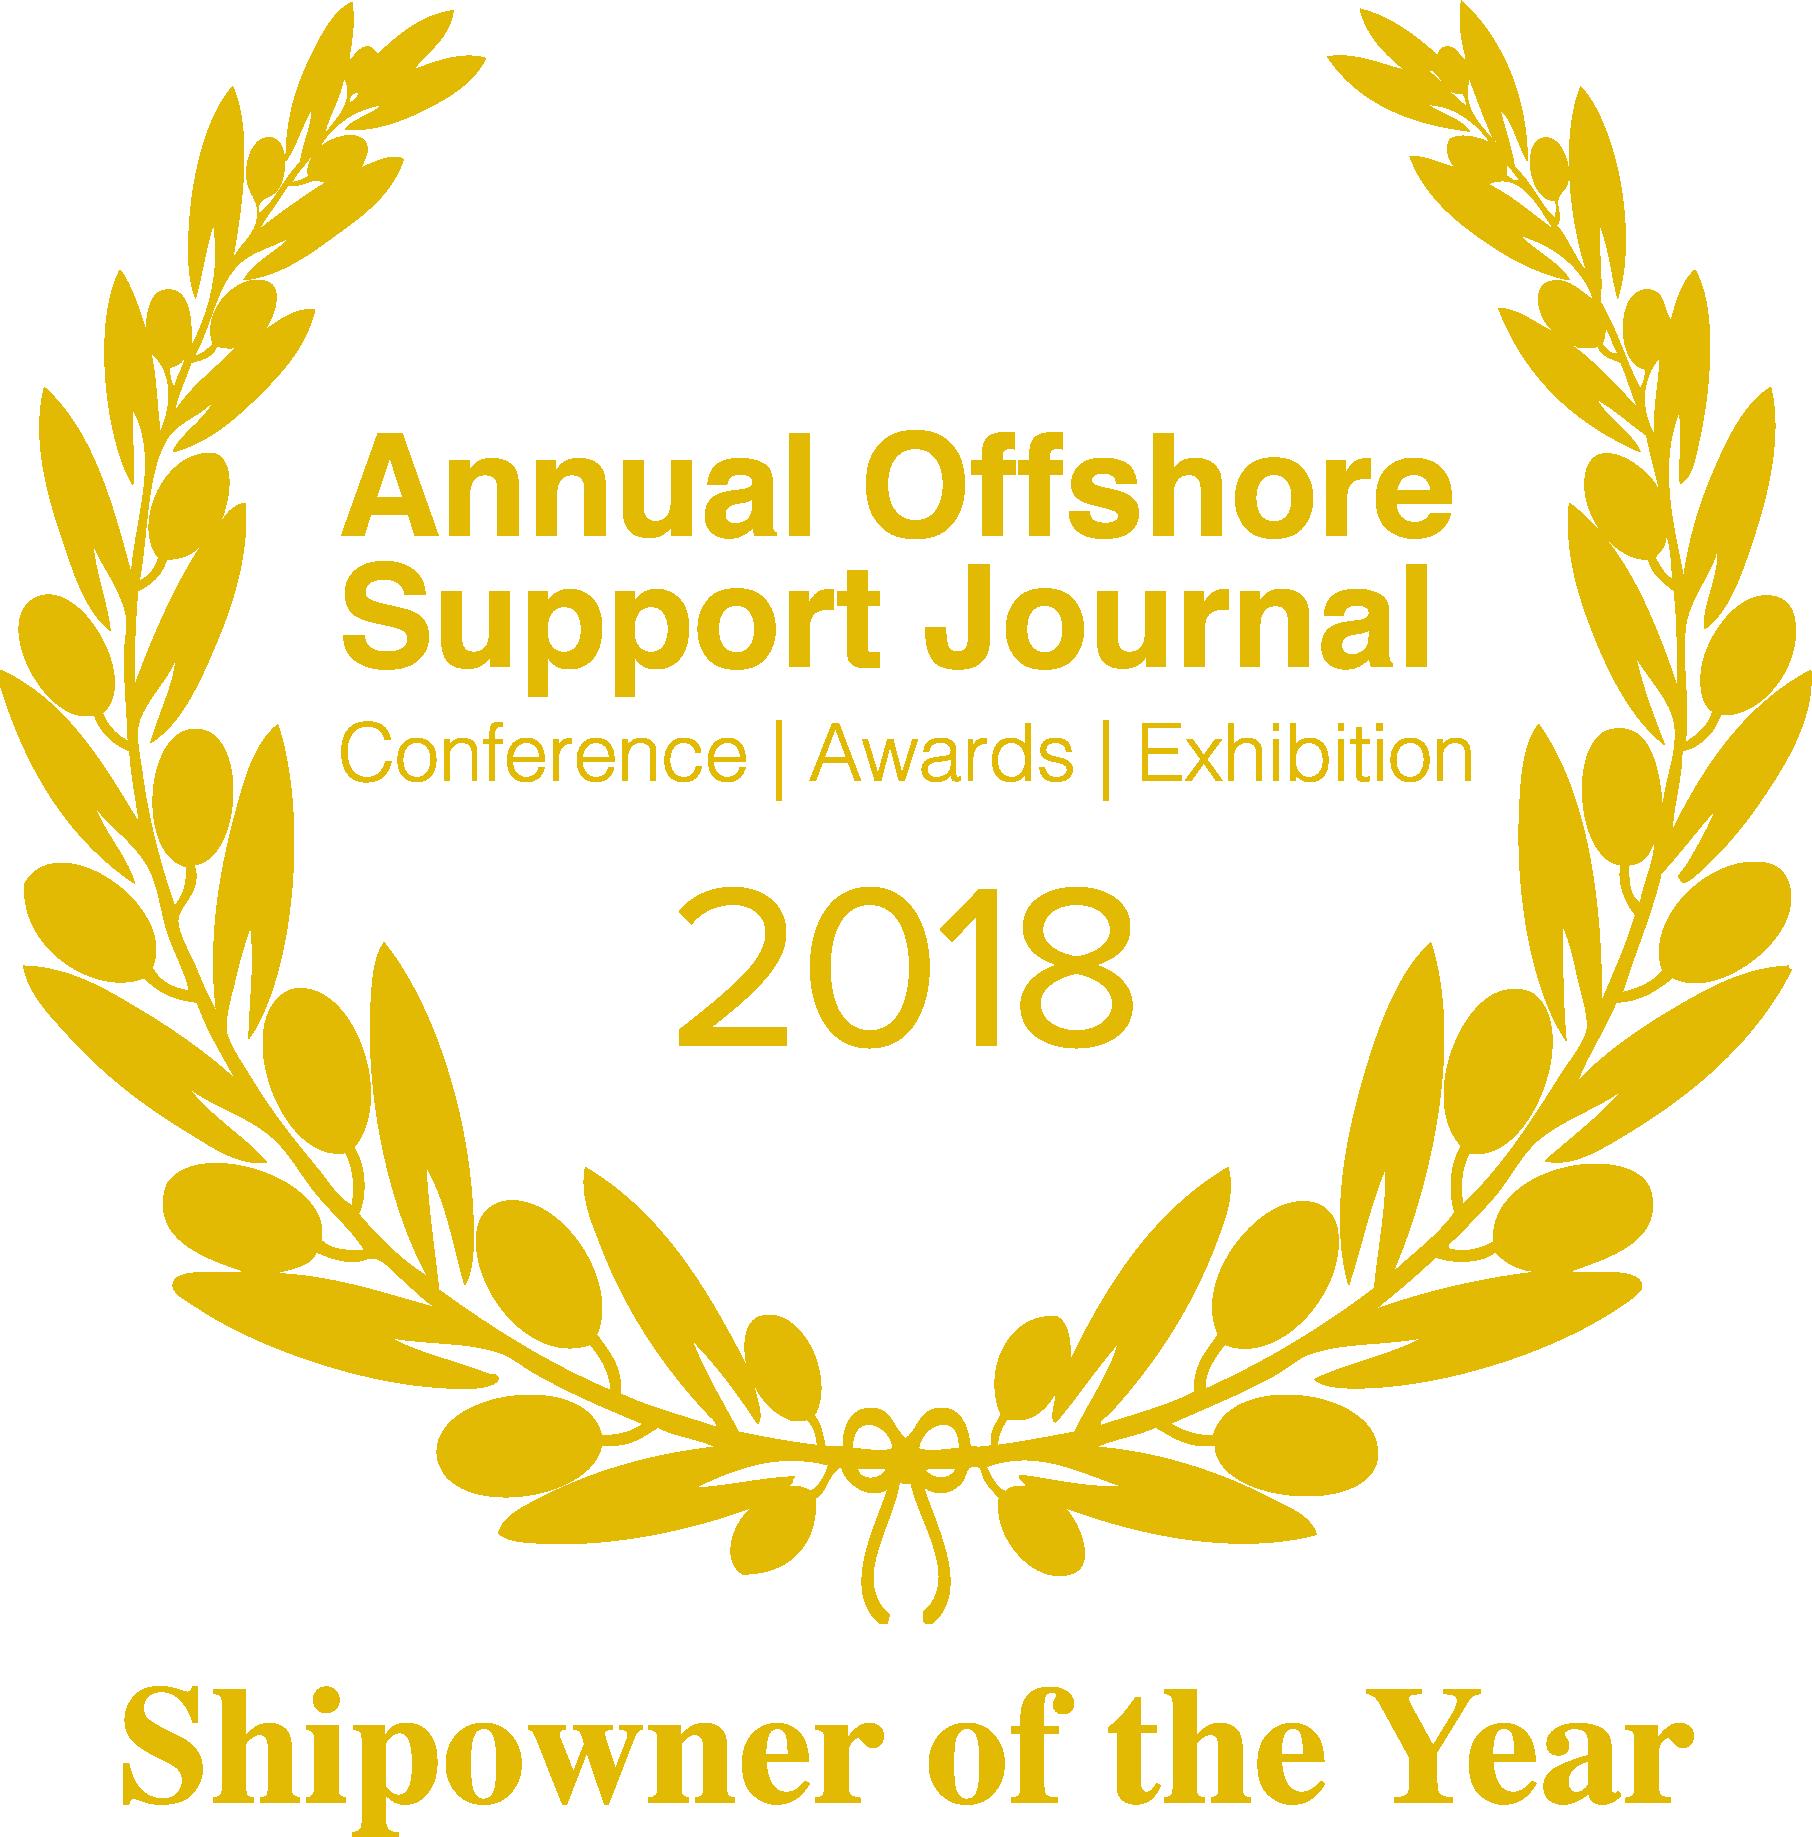 Shipowner of the year award 2018